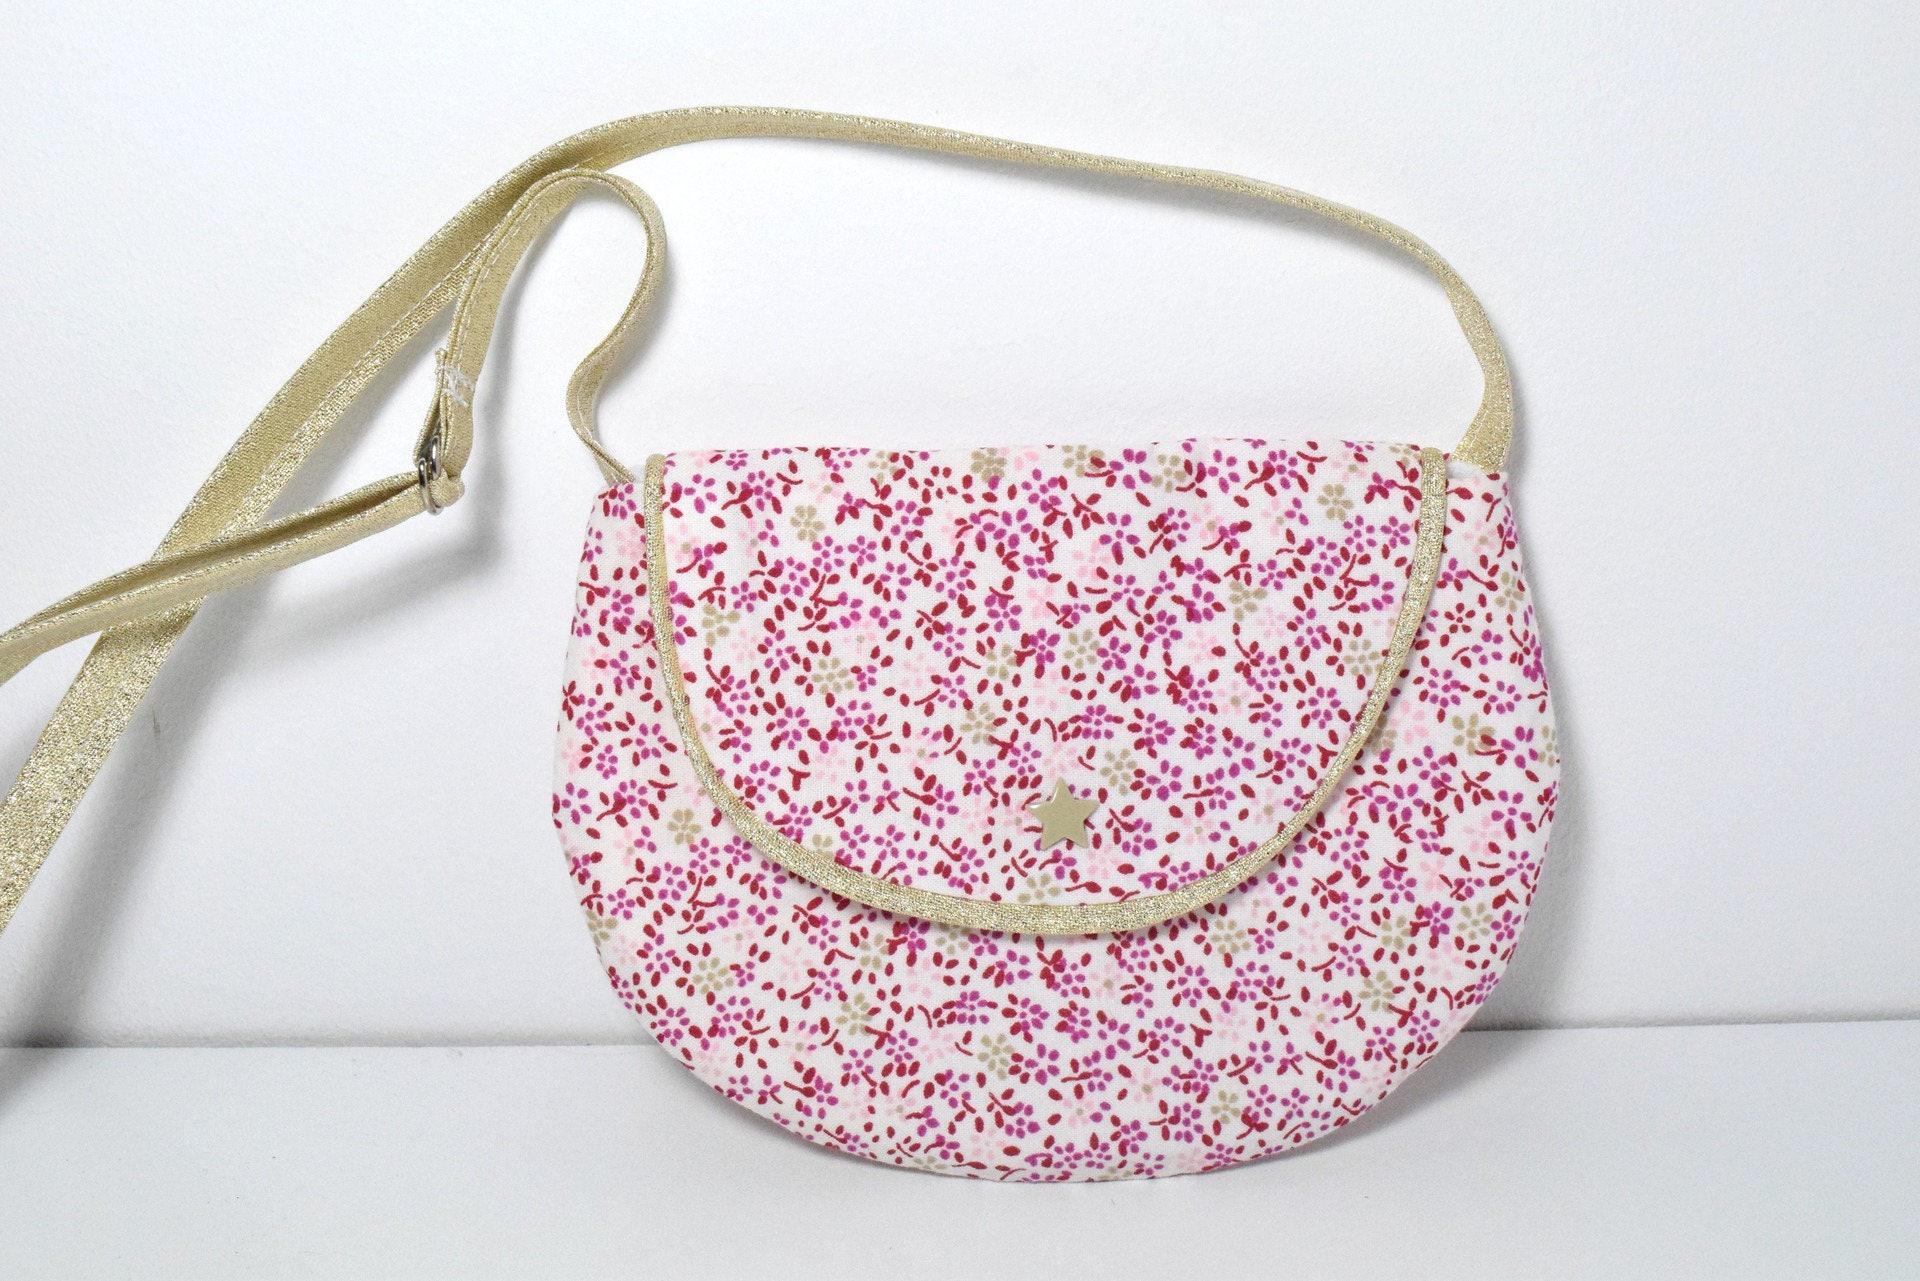 petit sac main fille enfant 2 10 ans tissu petites fleurs etsy. Black Bedroom Furniture Sets. Home Design Ideas